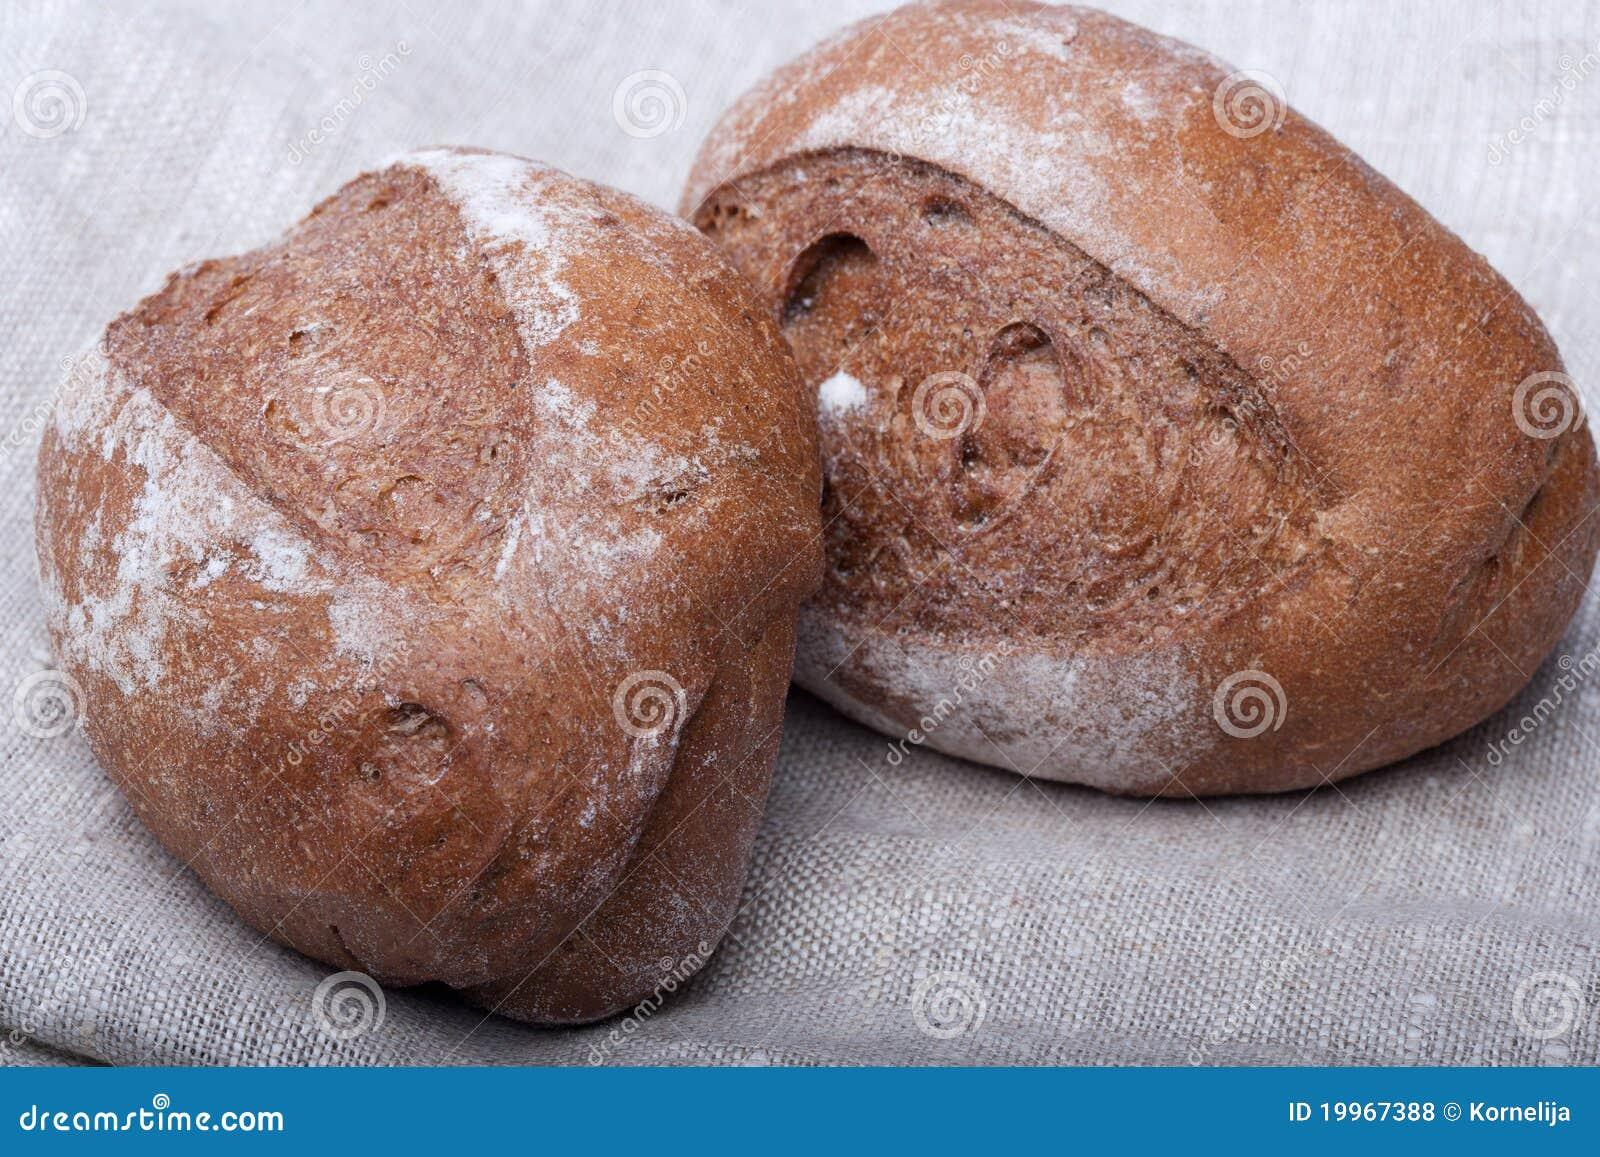 Dark Bread Royalty Free Stock Photos - Image: 19967388